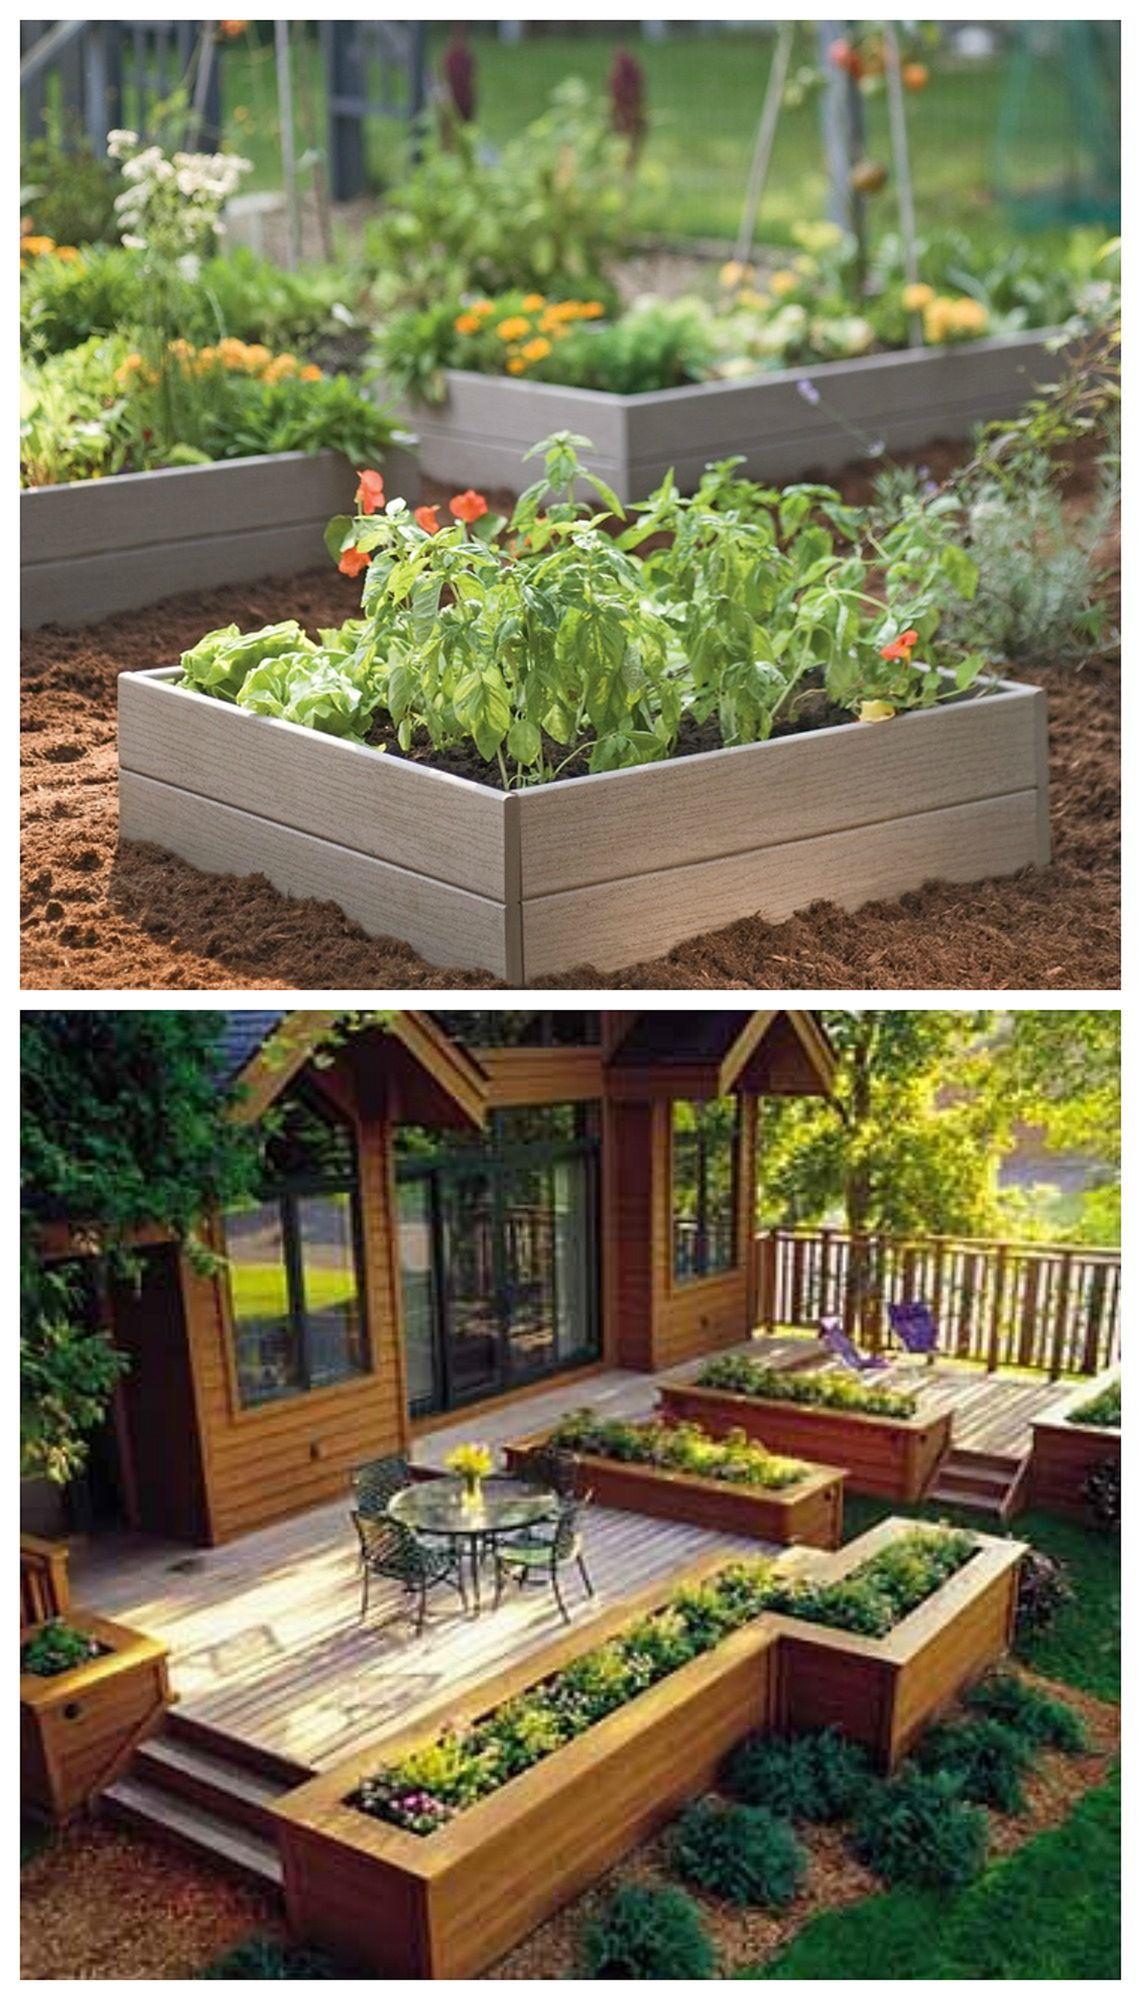 Garden Idea DIY Projects